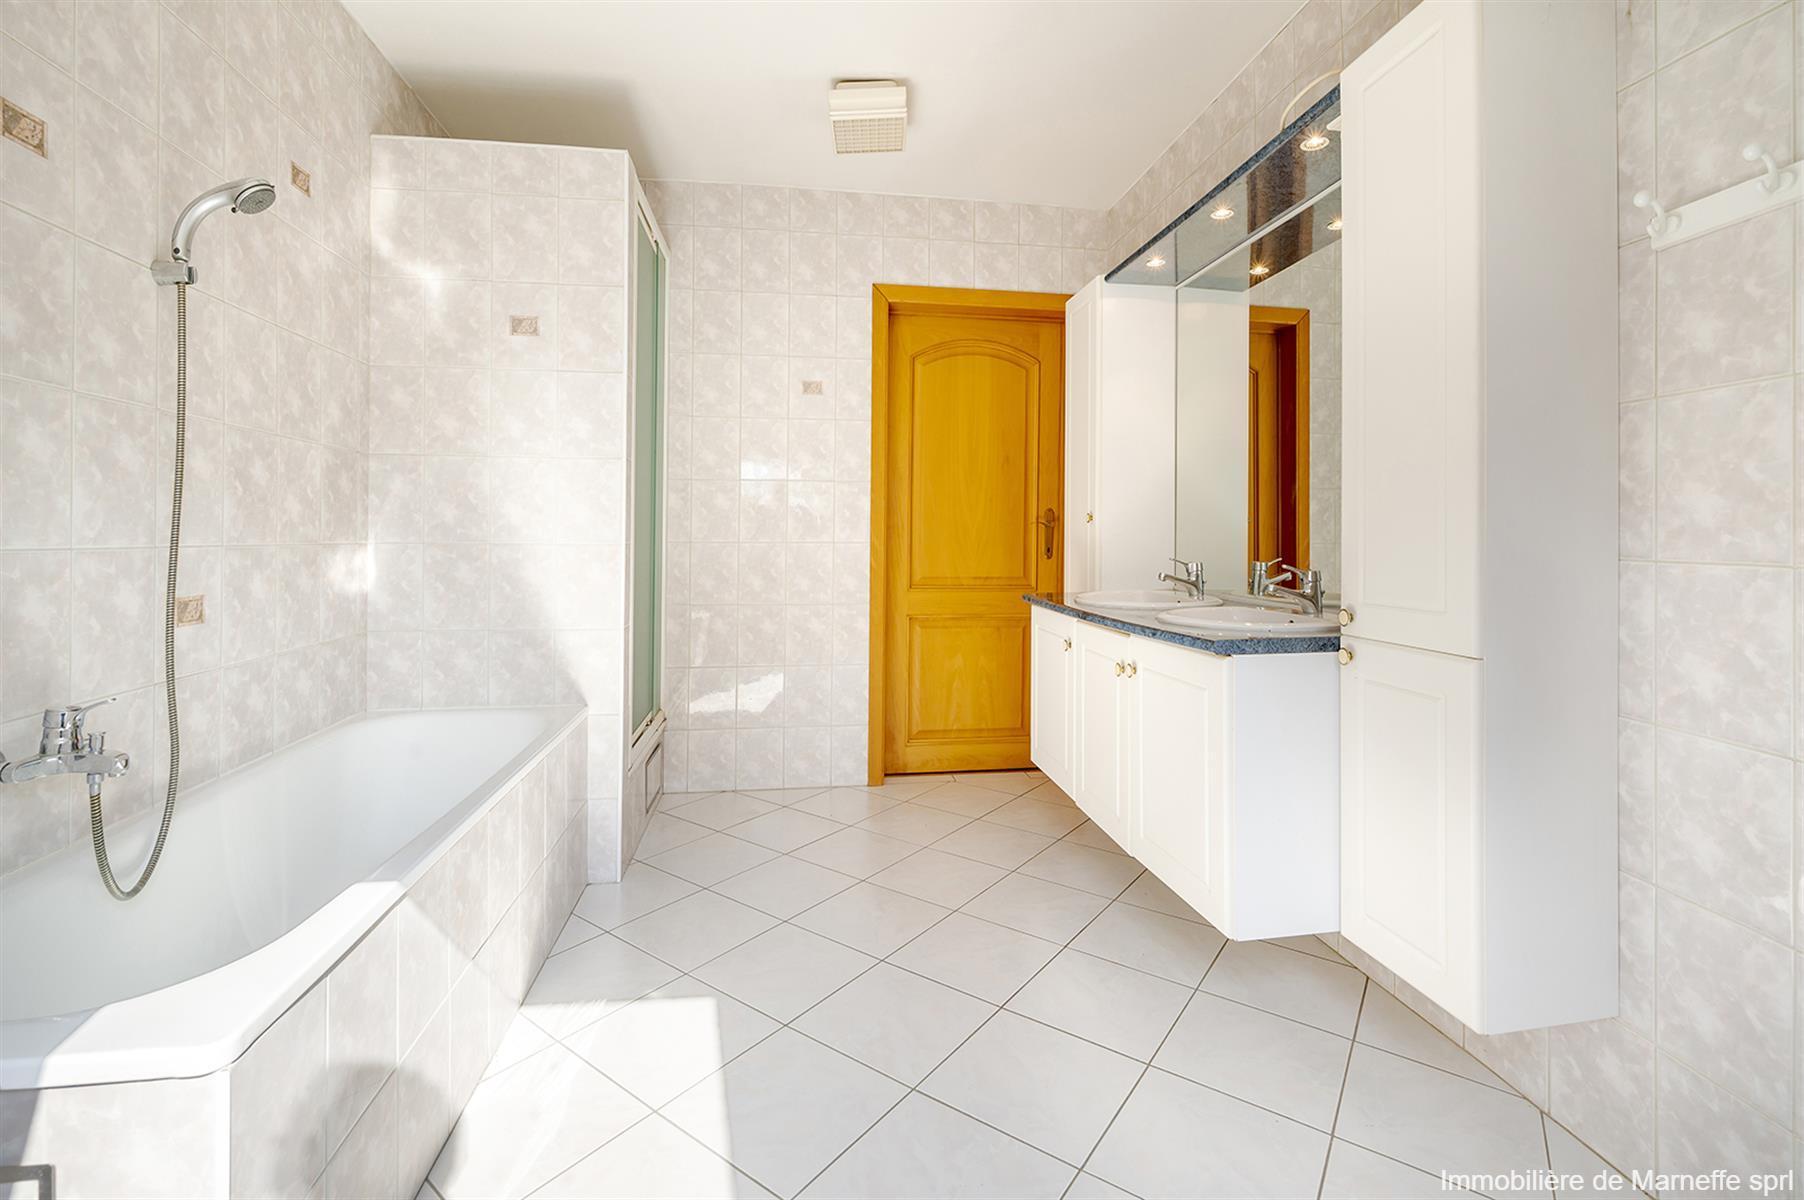 Maison - Donceel - #4036440-18